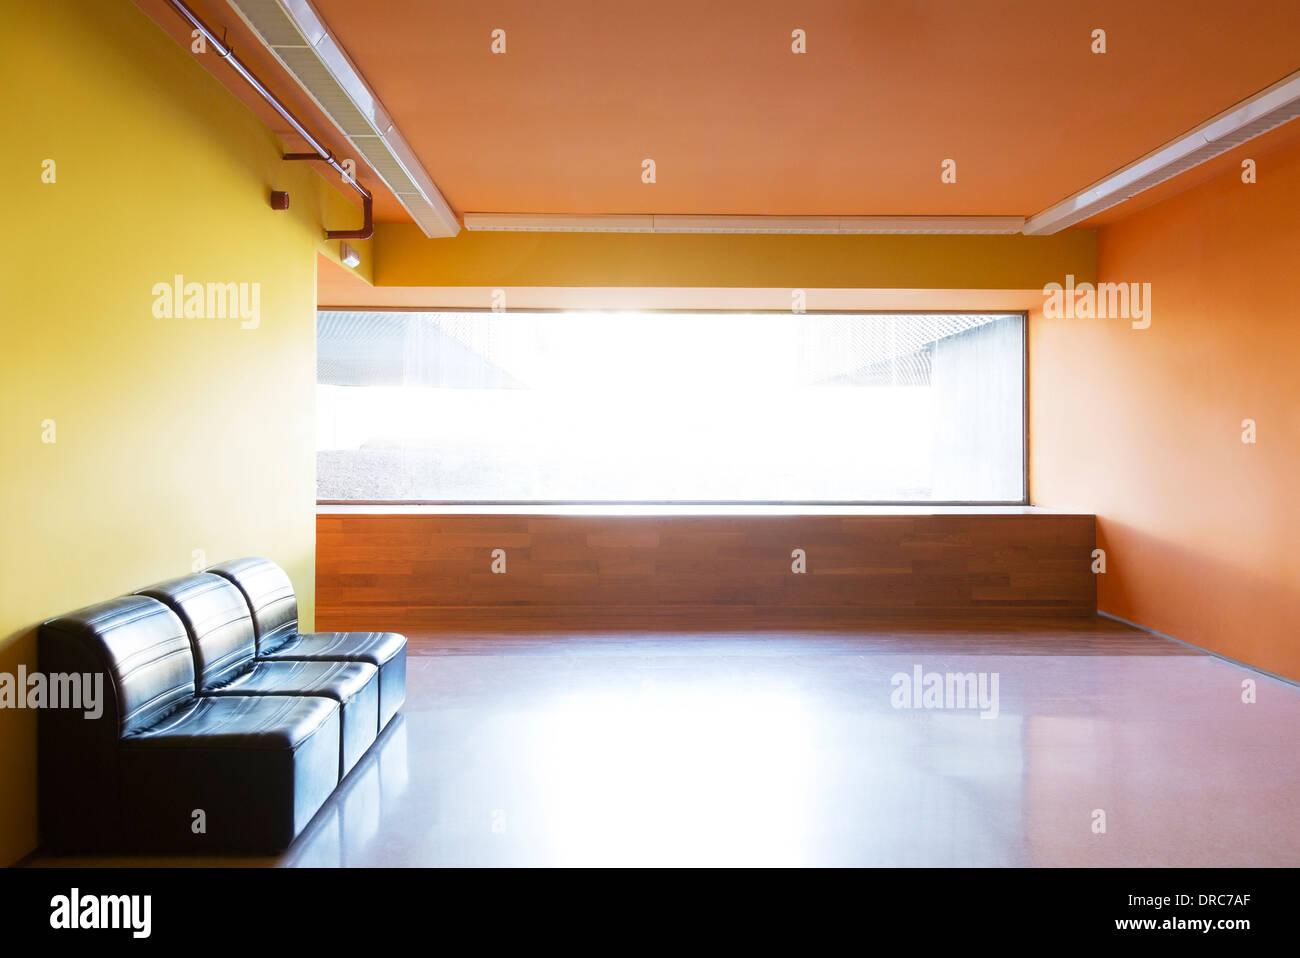 Stühle und Fenster in leere lobby Stockbild